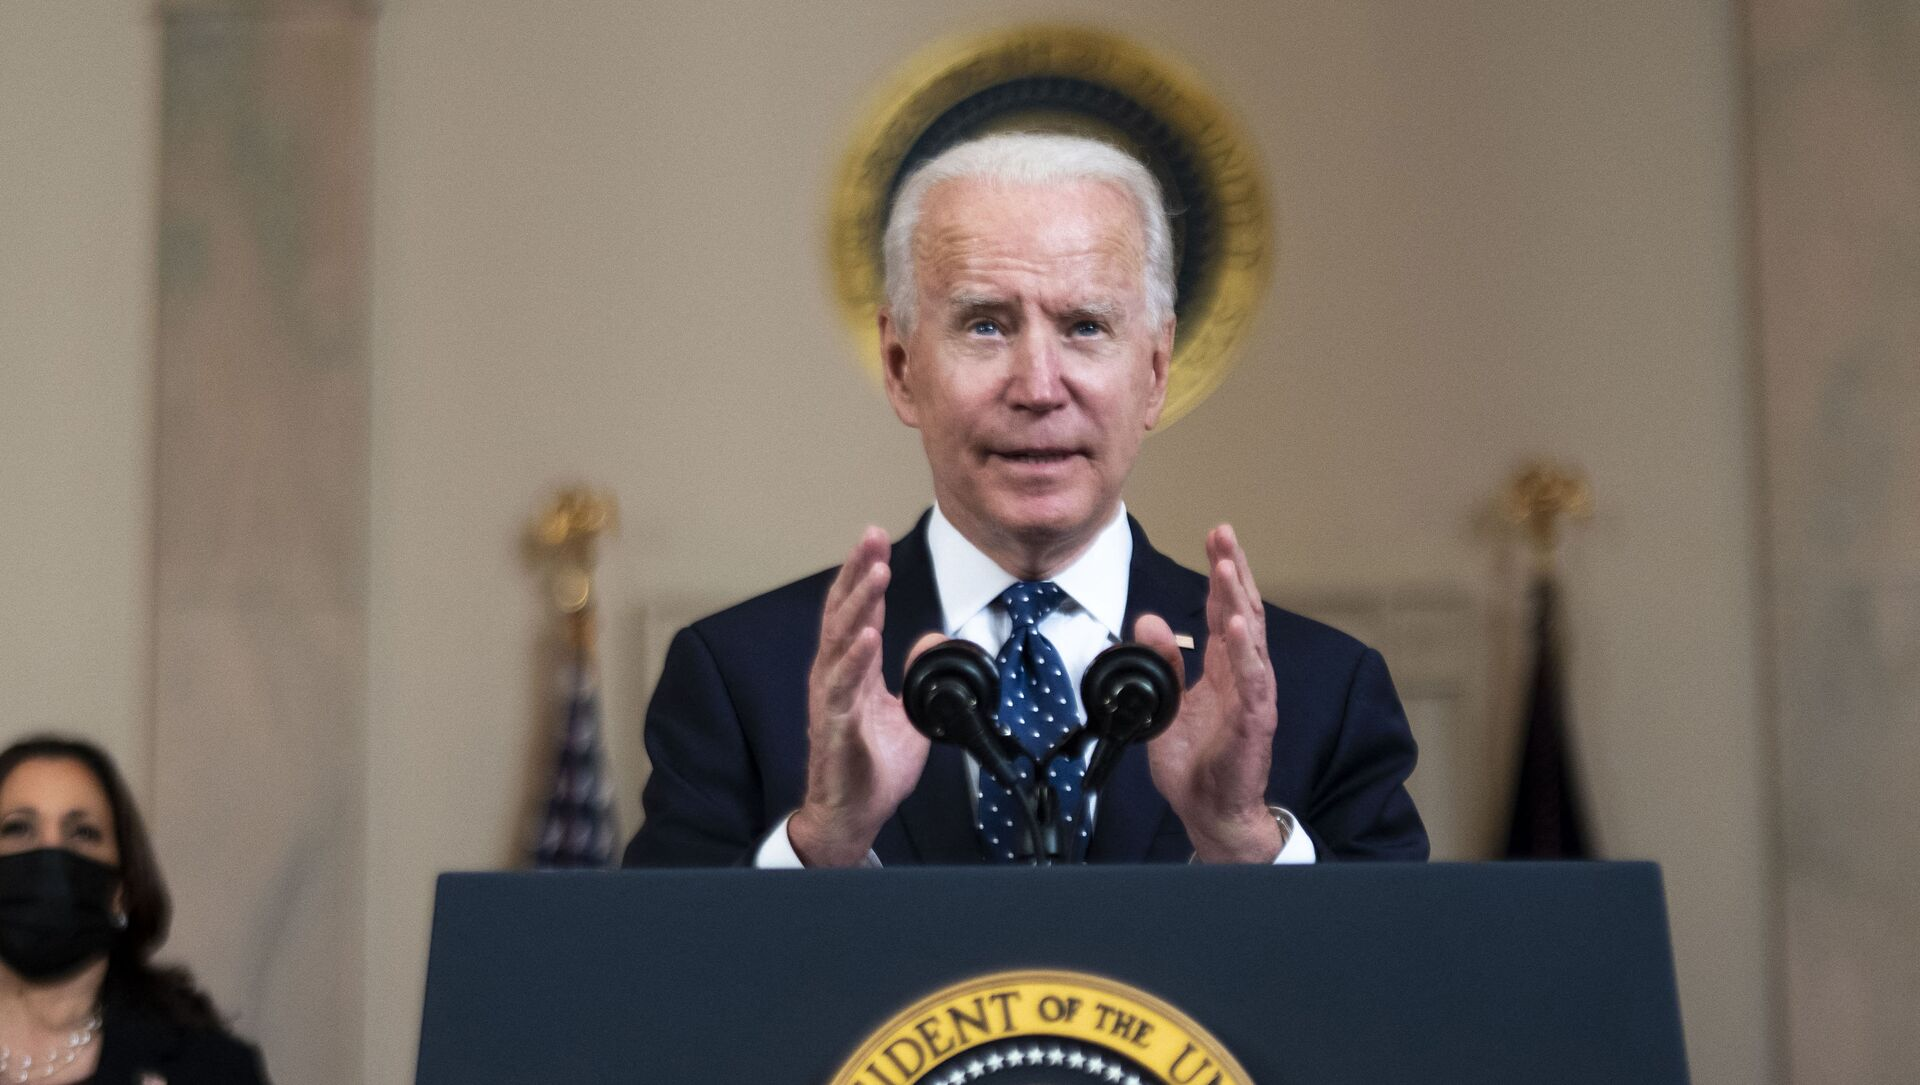 Prezydent USA Joe Biden. - Sputnik Polska, 1920, 30.04.2021